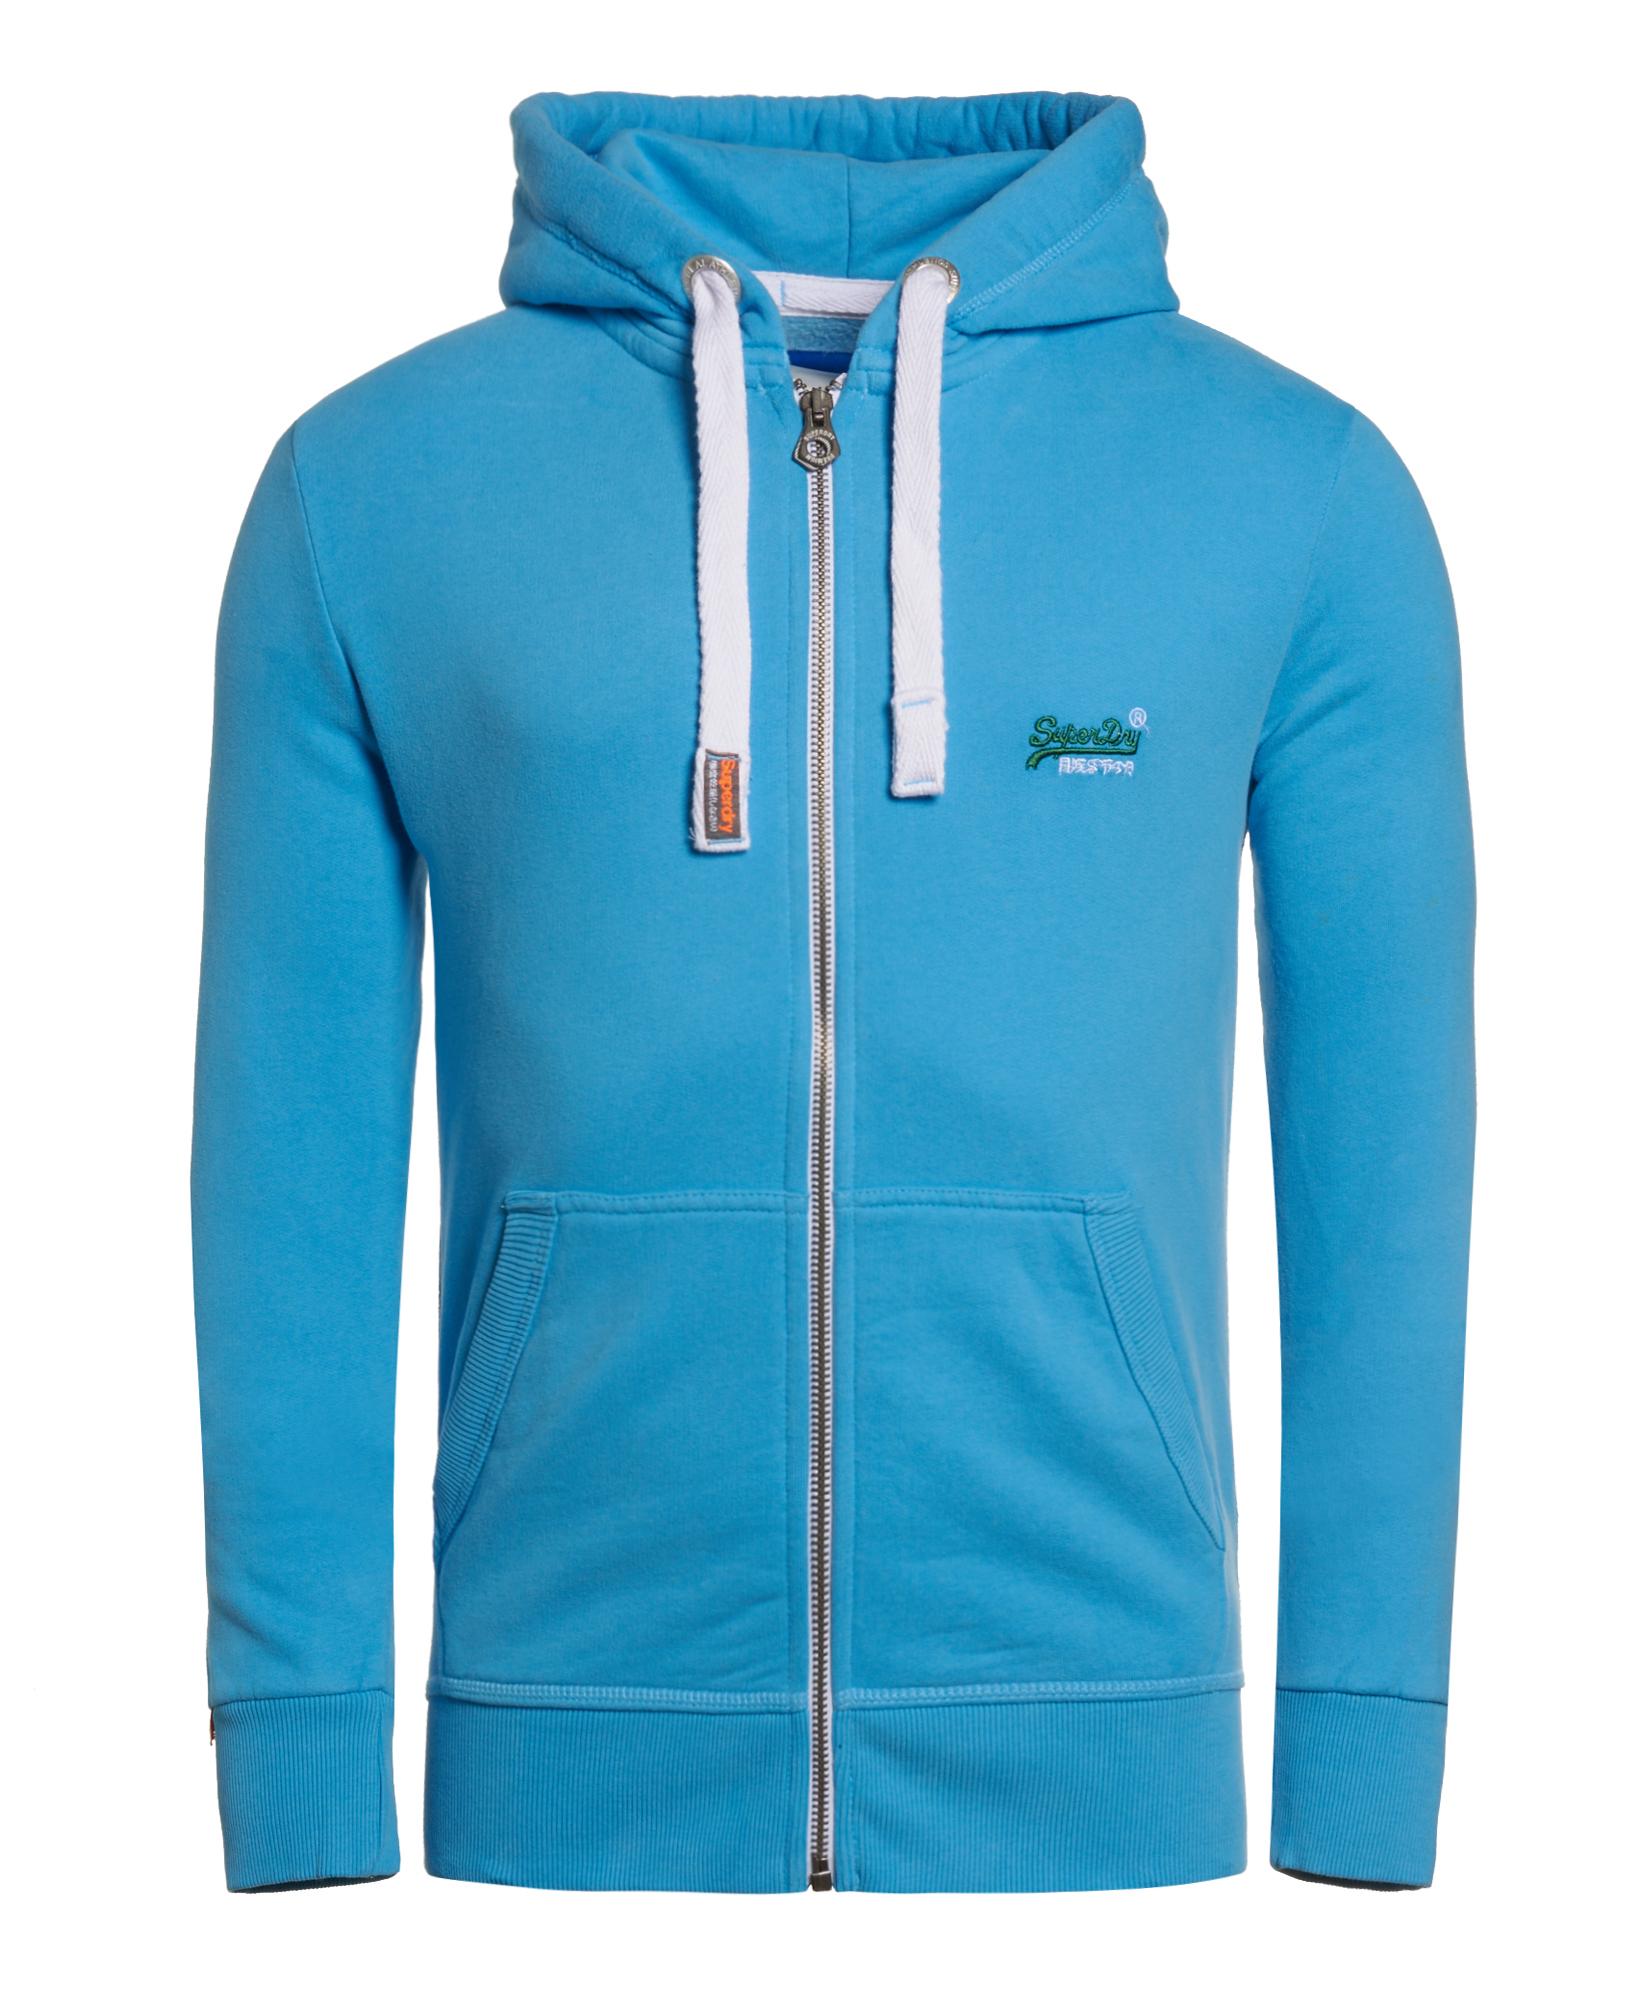 neuer herren superdry orange label primary zip hoodie soho blue ebay. Black Bedroom Furniture Sets. Home Design Ideas